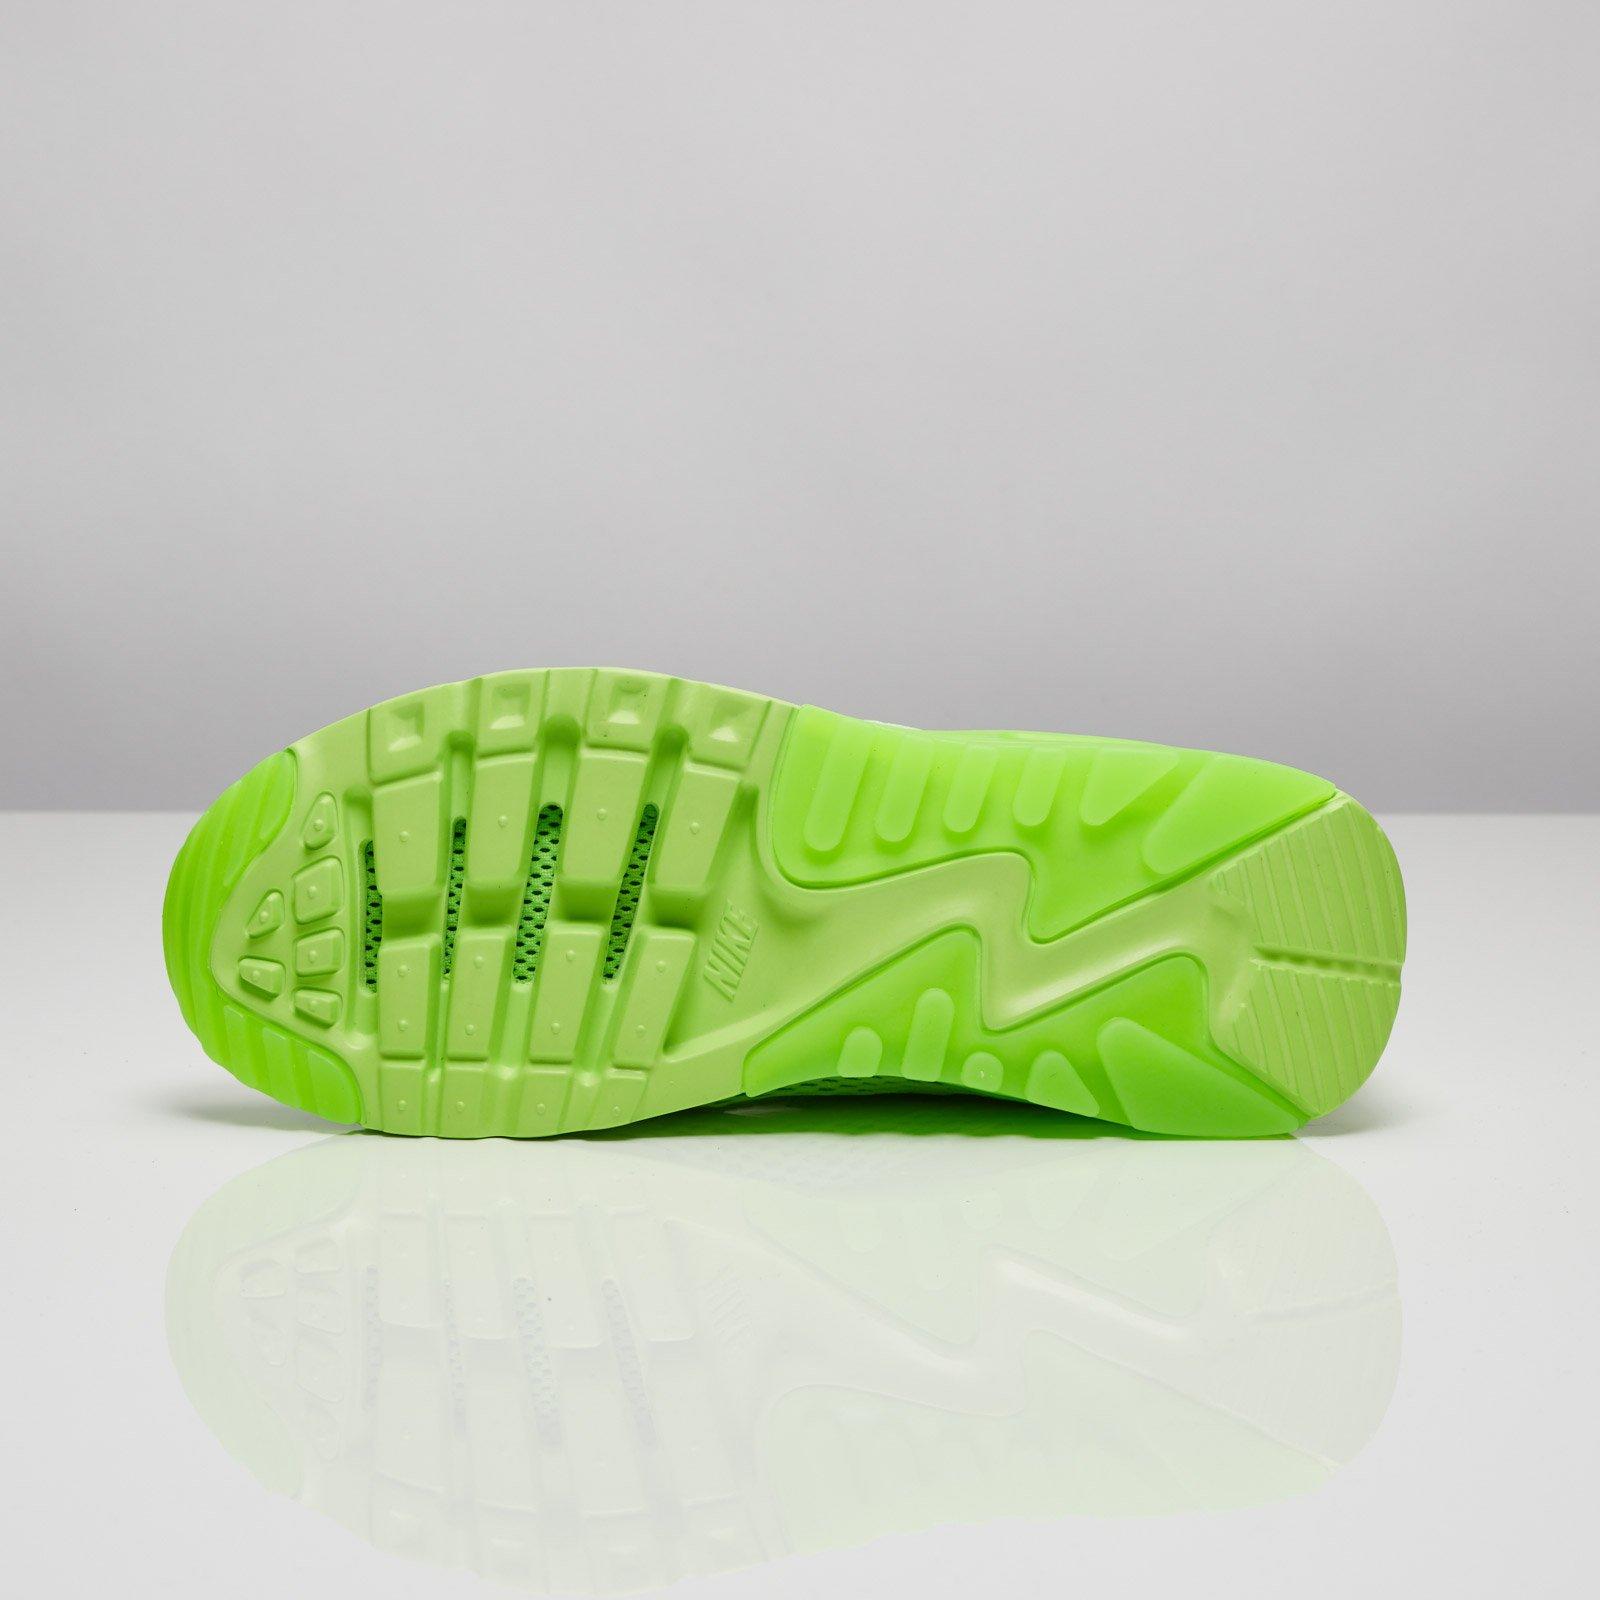 4f086c0473 Nike W Air Max 90 BR - 725061-300 - Sneakersnstuff | sneakers & streetwear  online since 1999